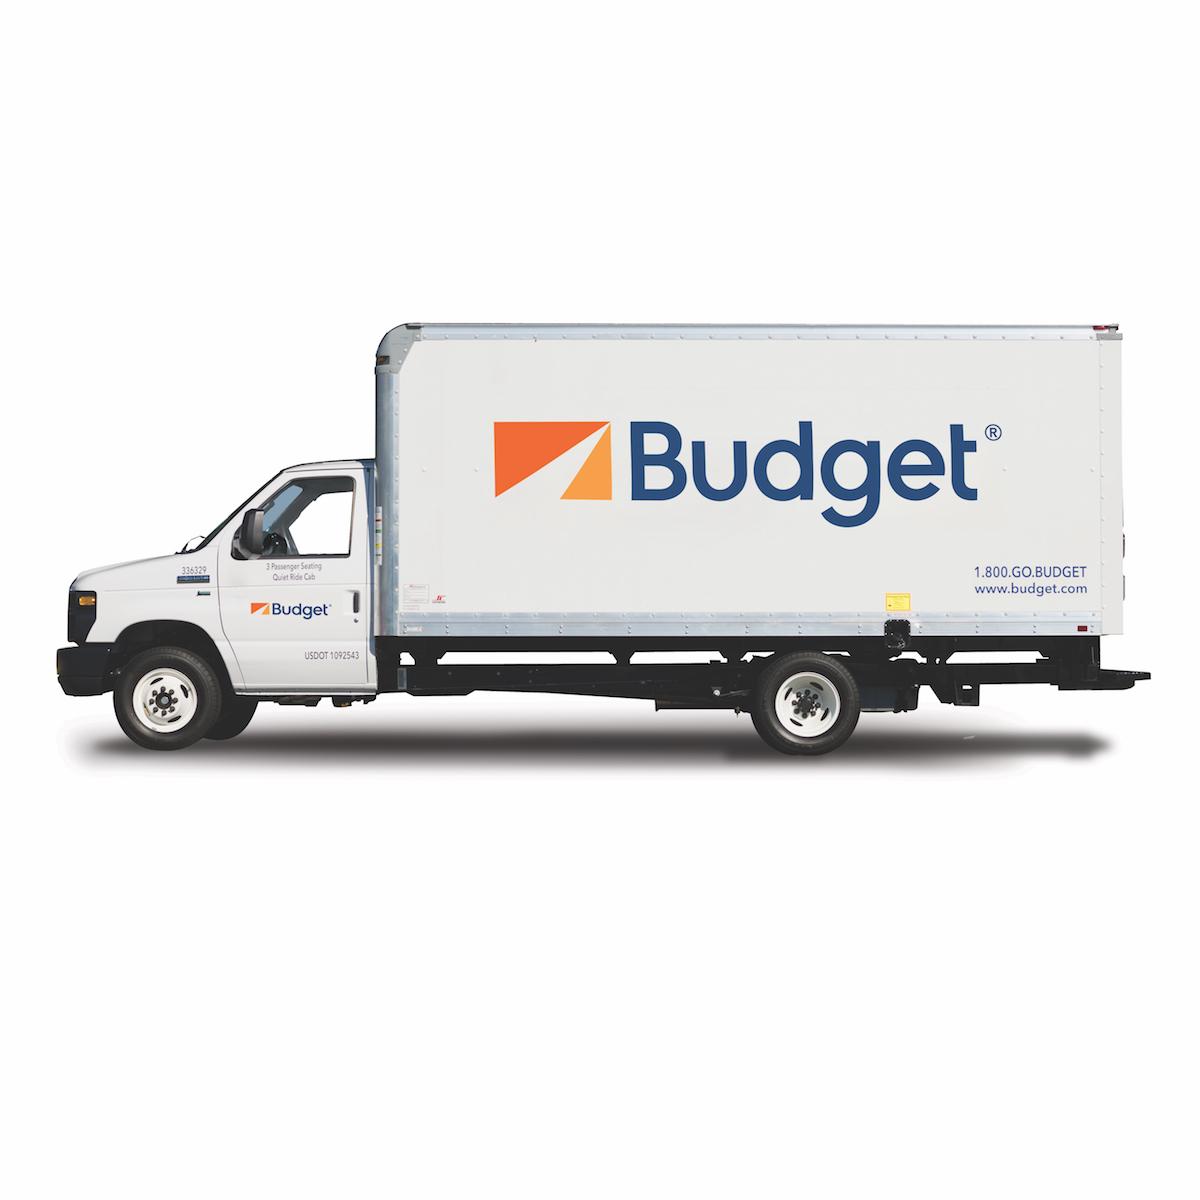 Budget Truck Rental 25% Off Discount Code @budgettruck.com